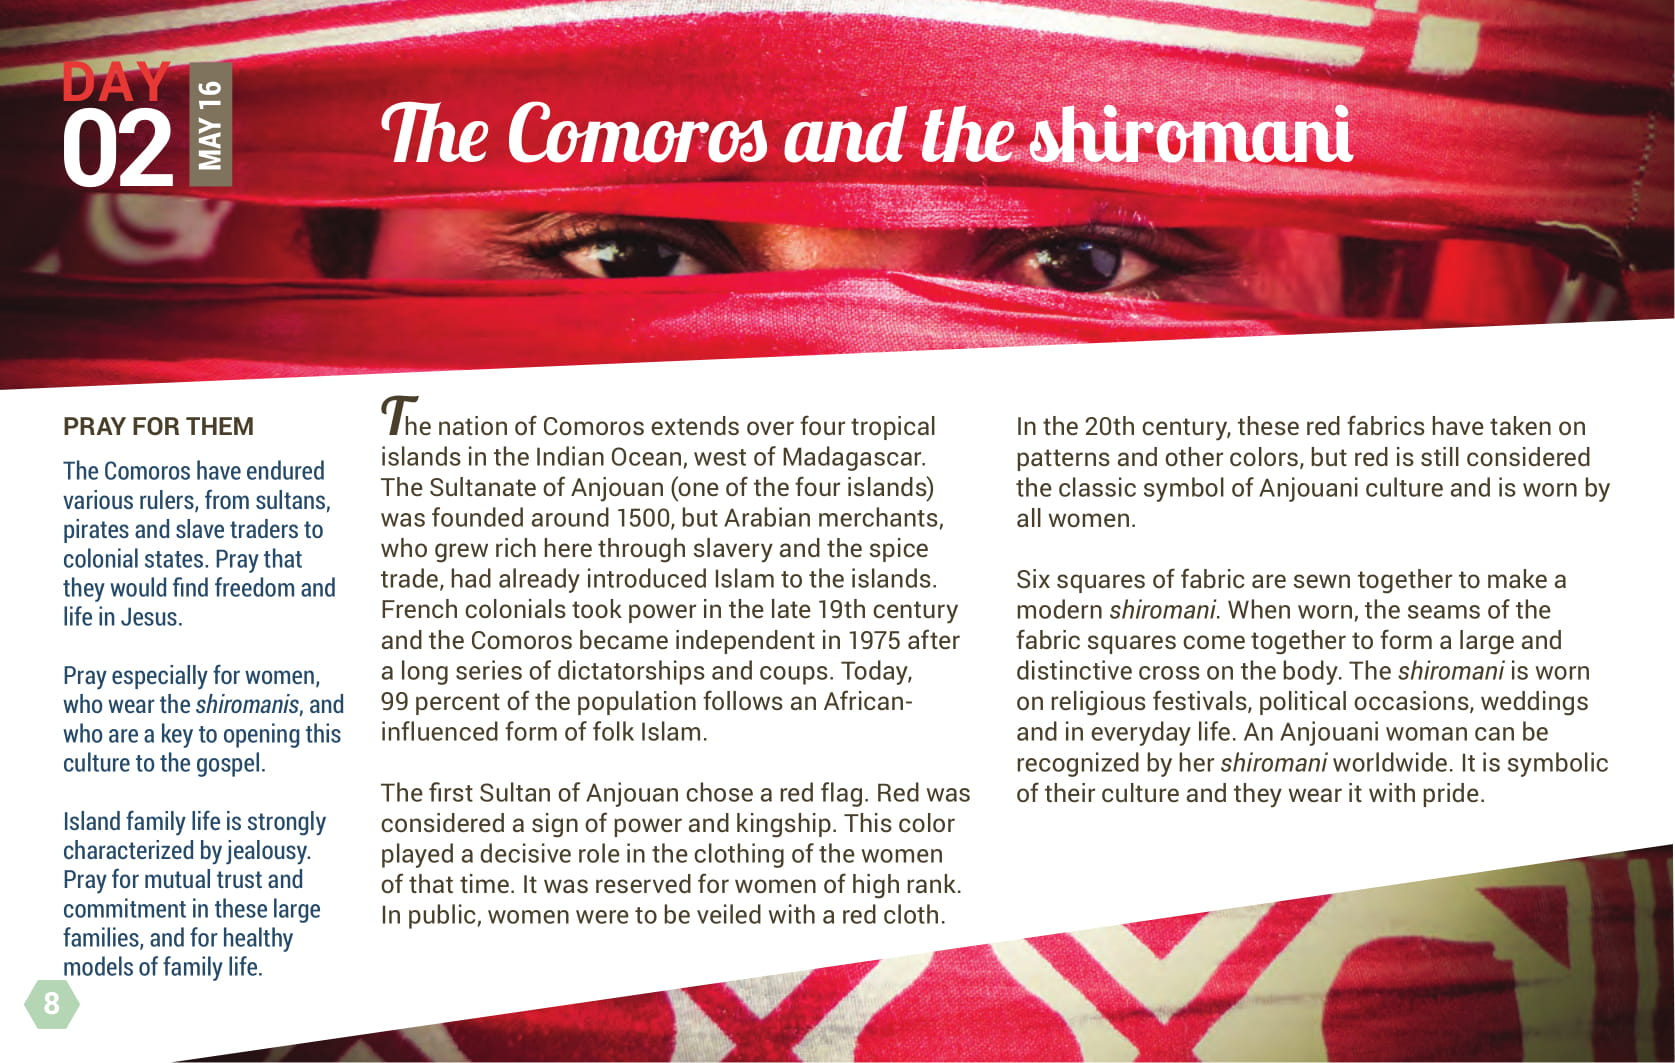 Day 02 - The Comoros and the shiomani